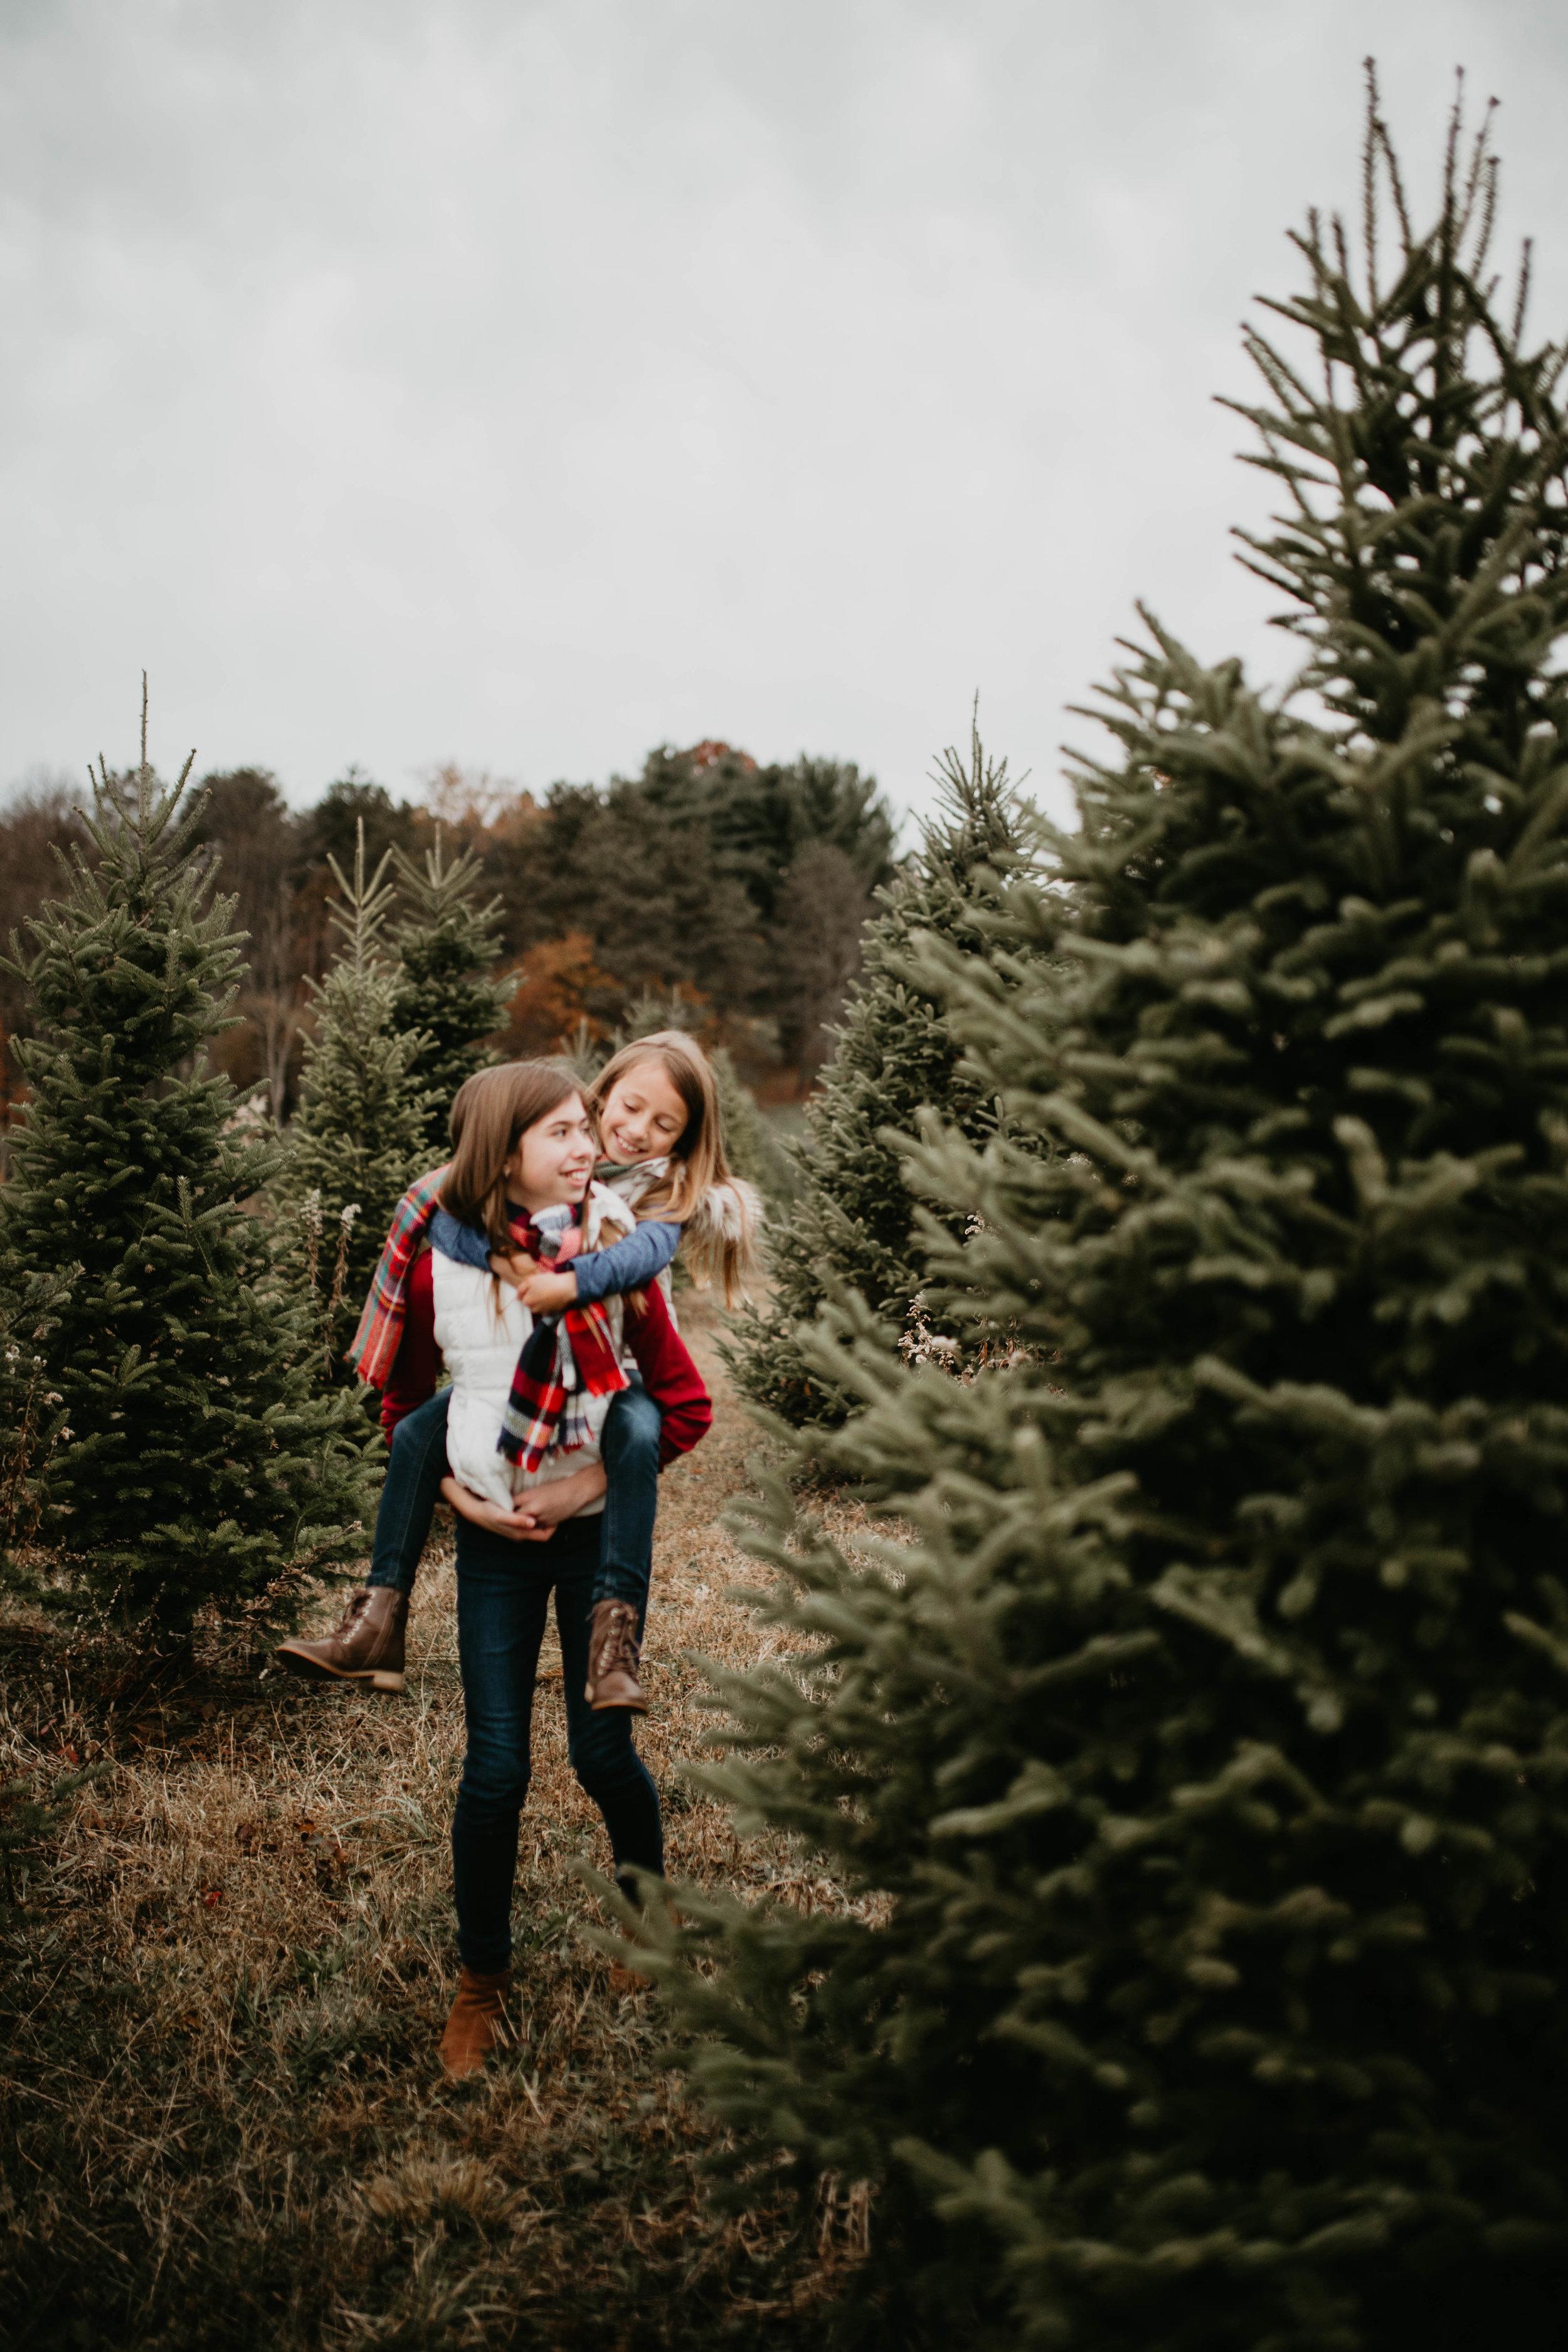 kids christmas 25 (1 of 1).jpg